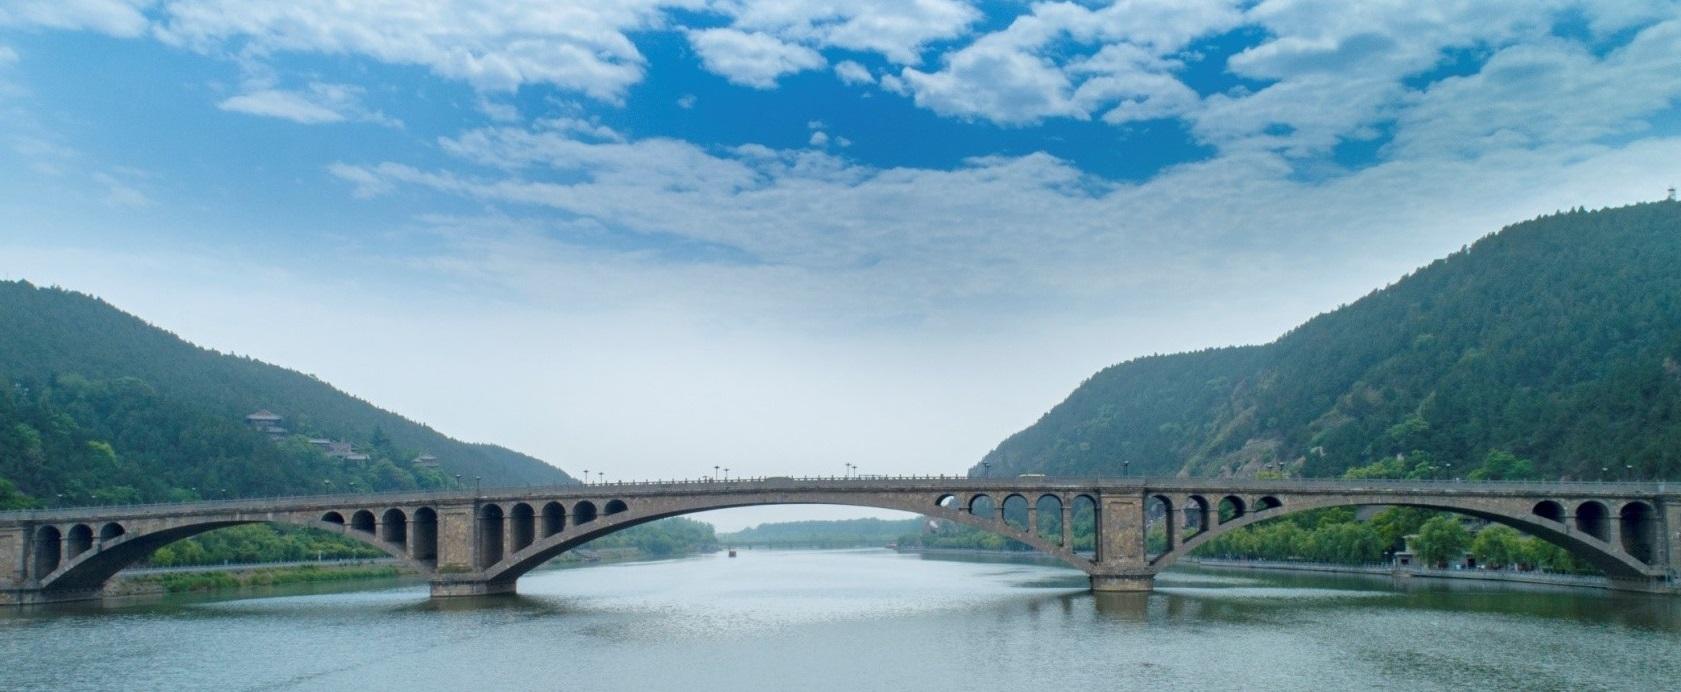 Luoyang Longmen Bridge